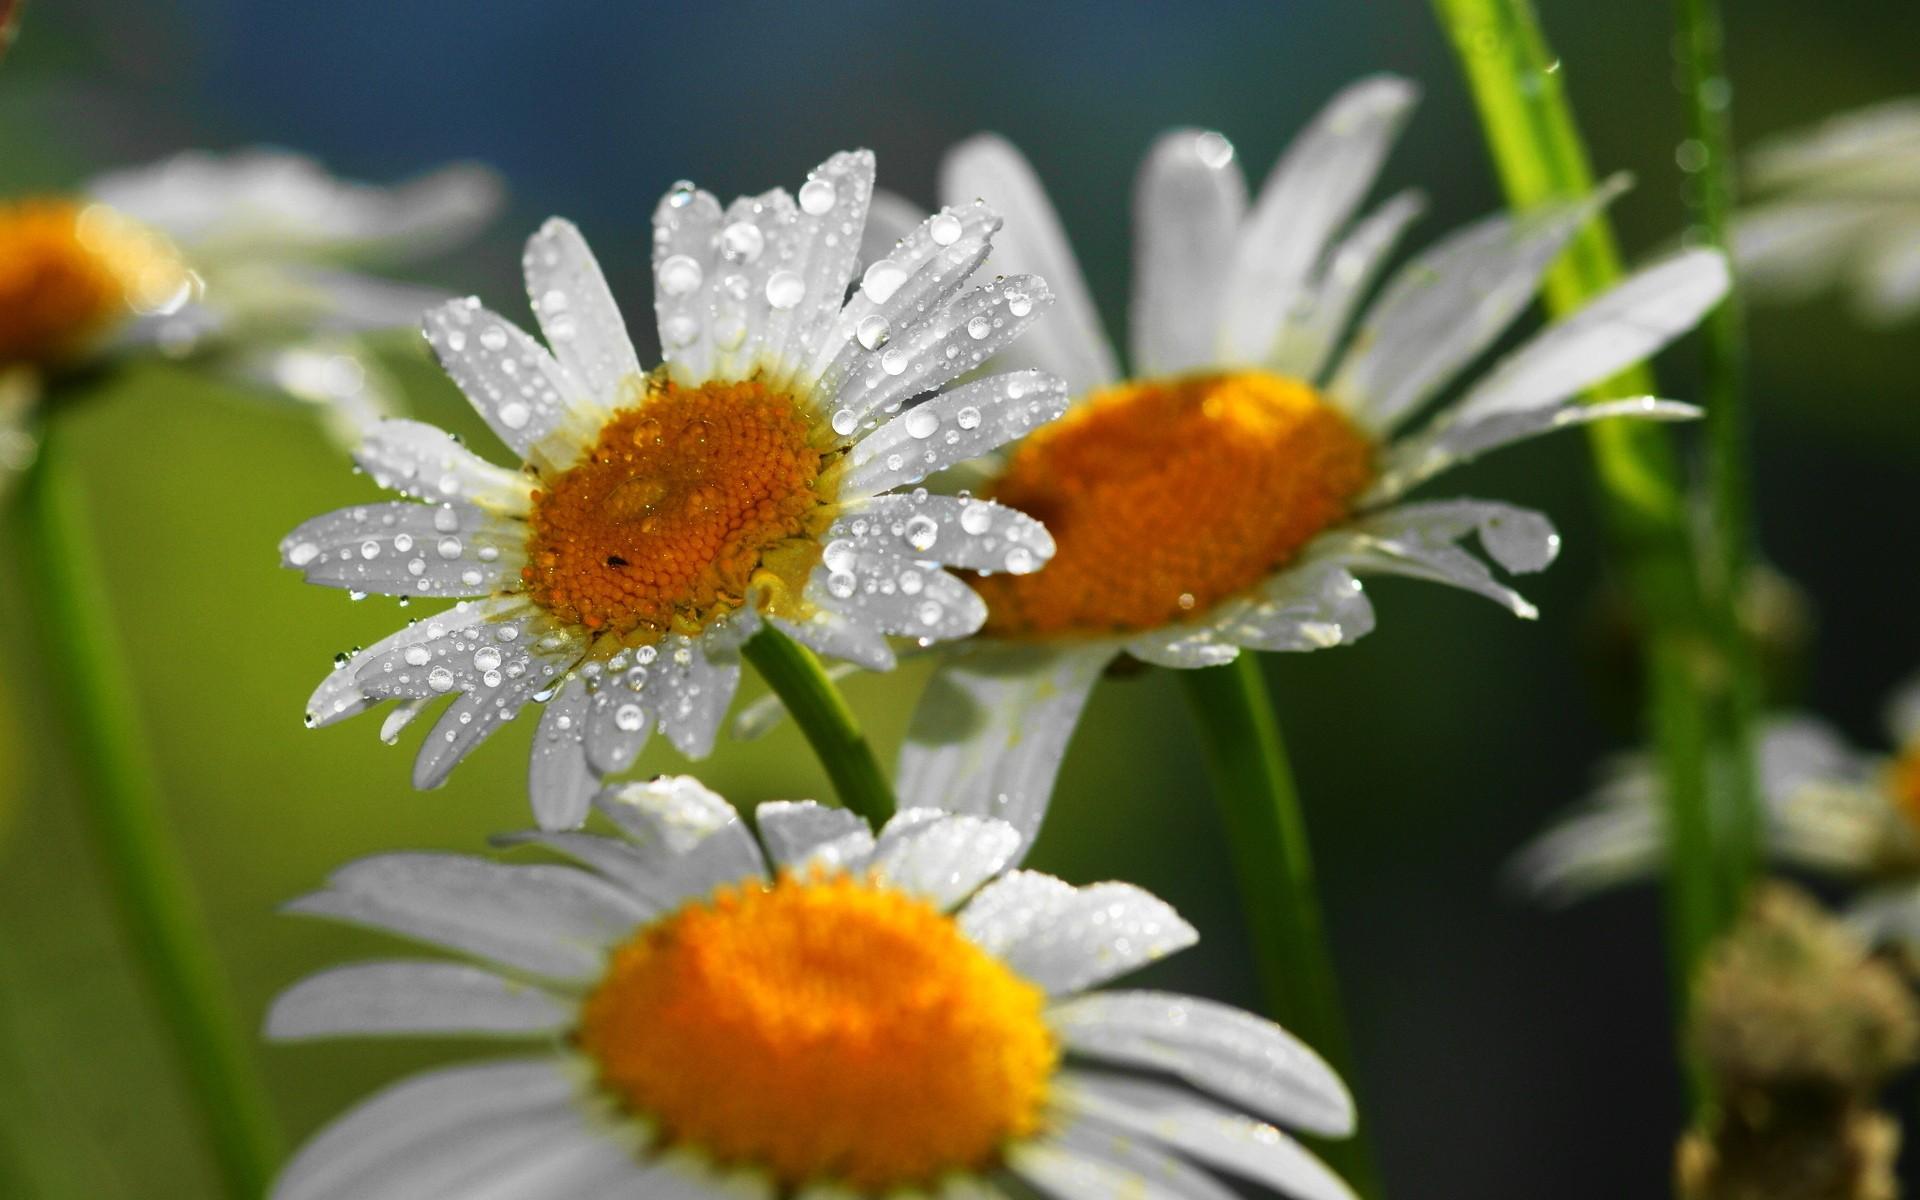 Flores margaritas y lluvia - 1920x1200